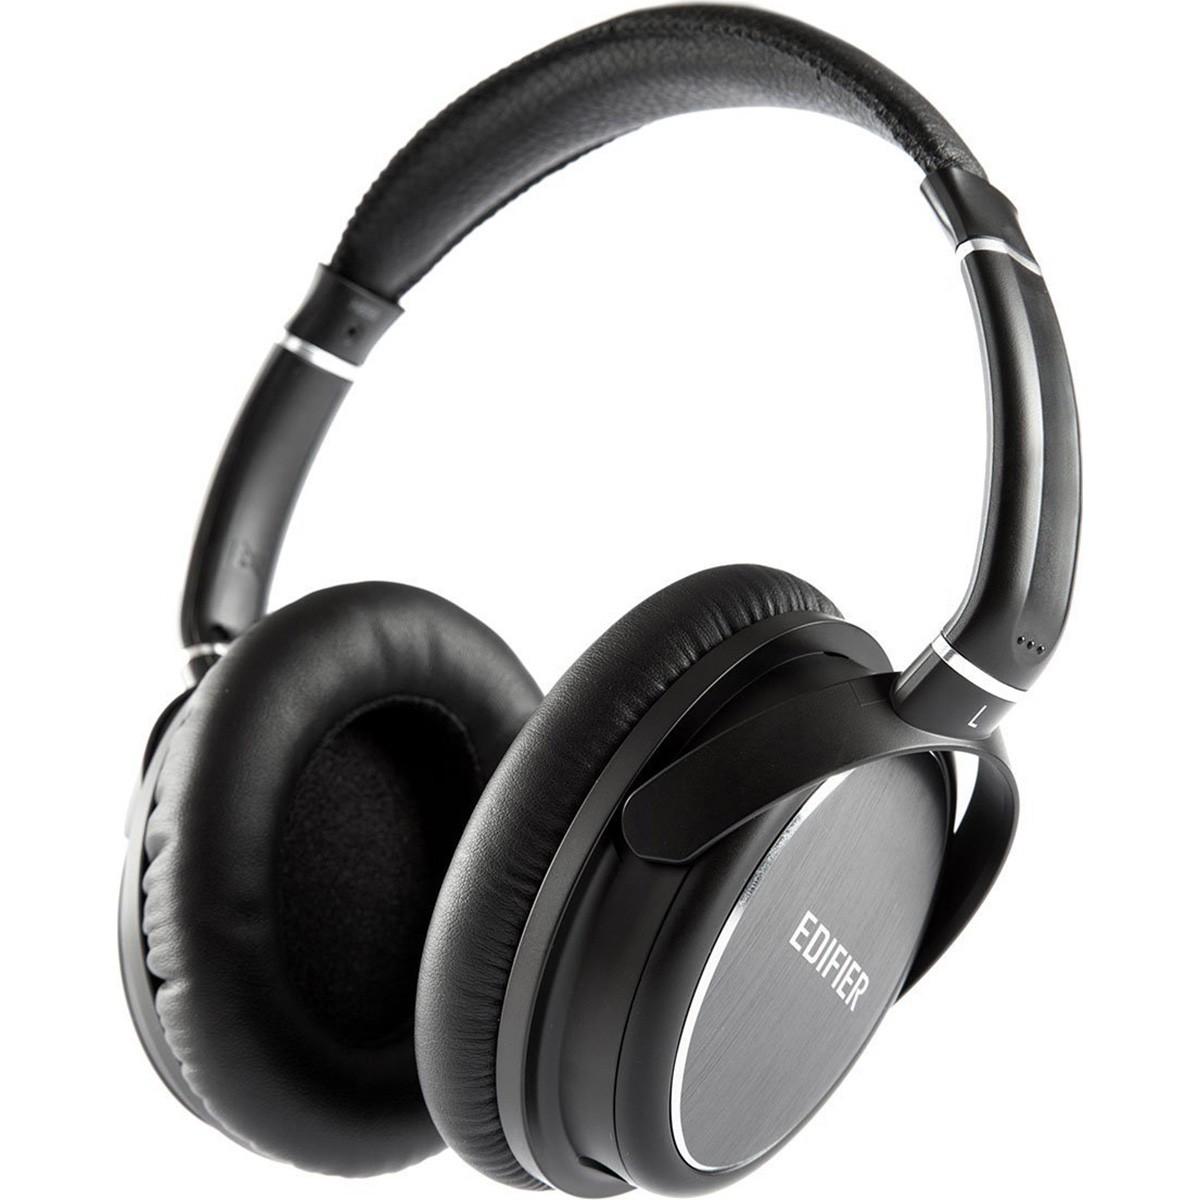 Edifier H850 Fone de Ouvido Profissional